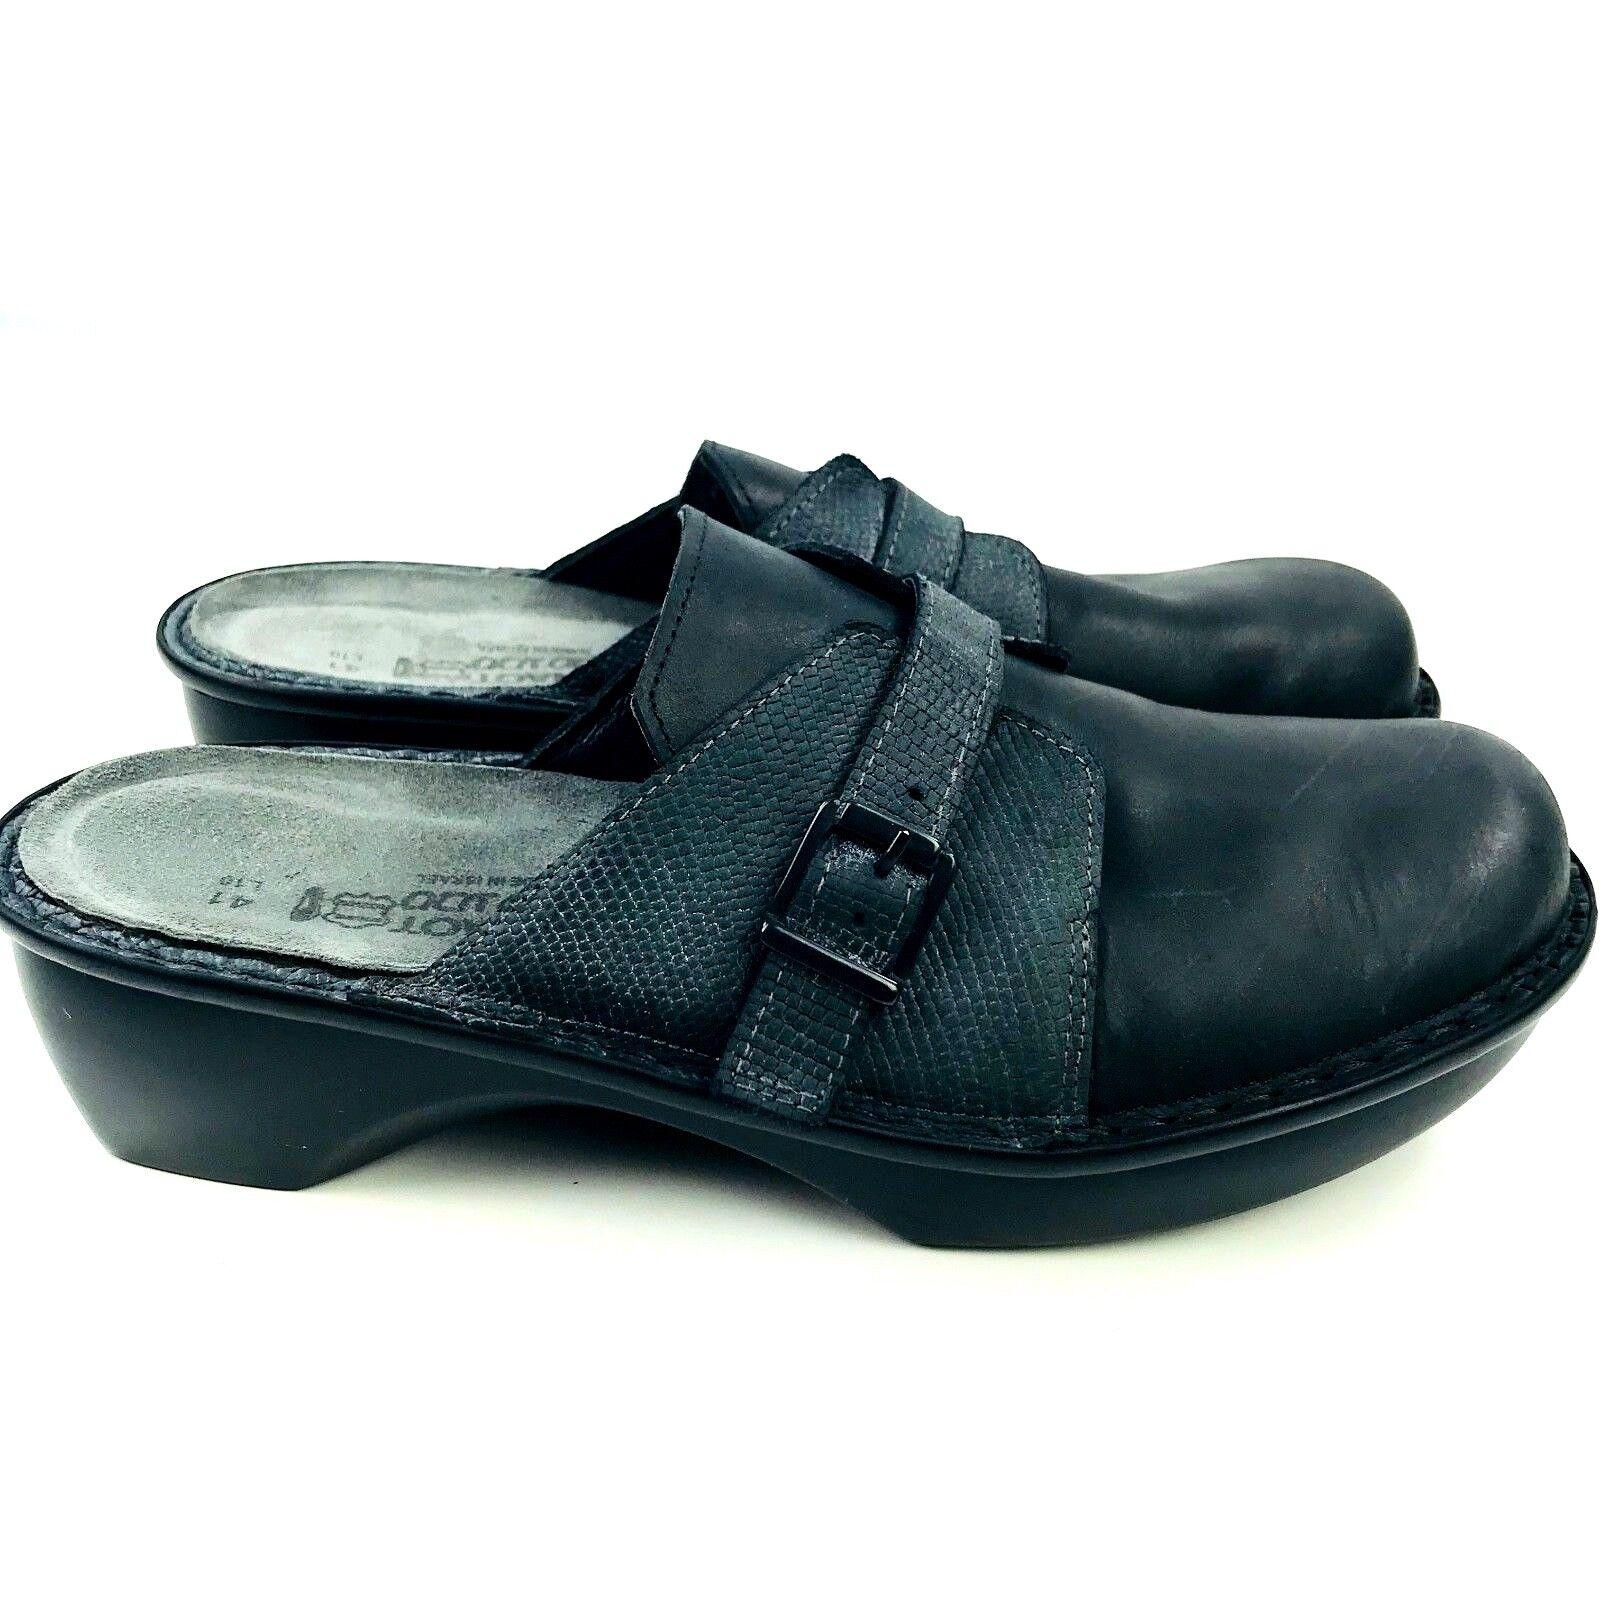 Naot Zapatos para mujer Talla 10 Negro Negro Negro Cuero Comodidad diapositivas Mulas Zuecos Slip On enfermera  diseñador en linea